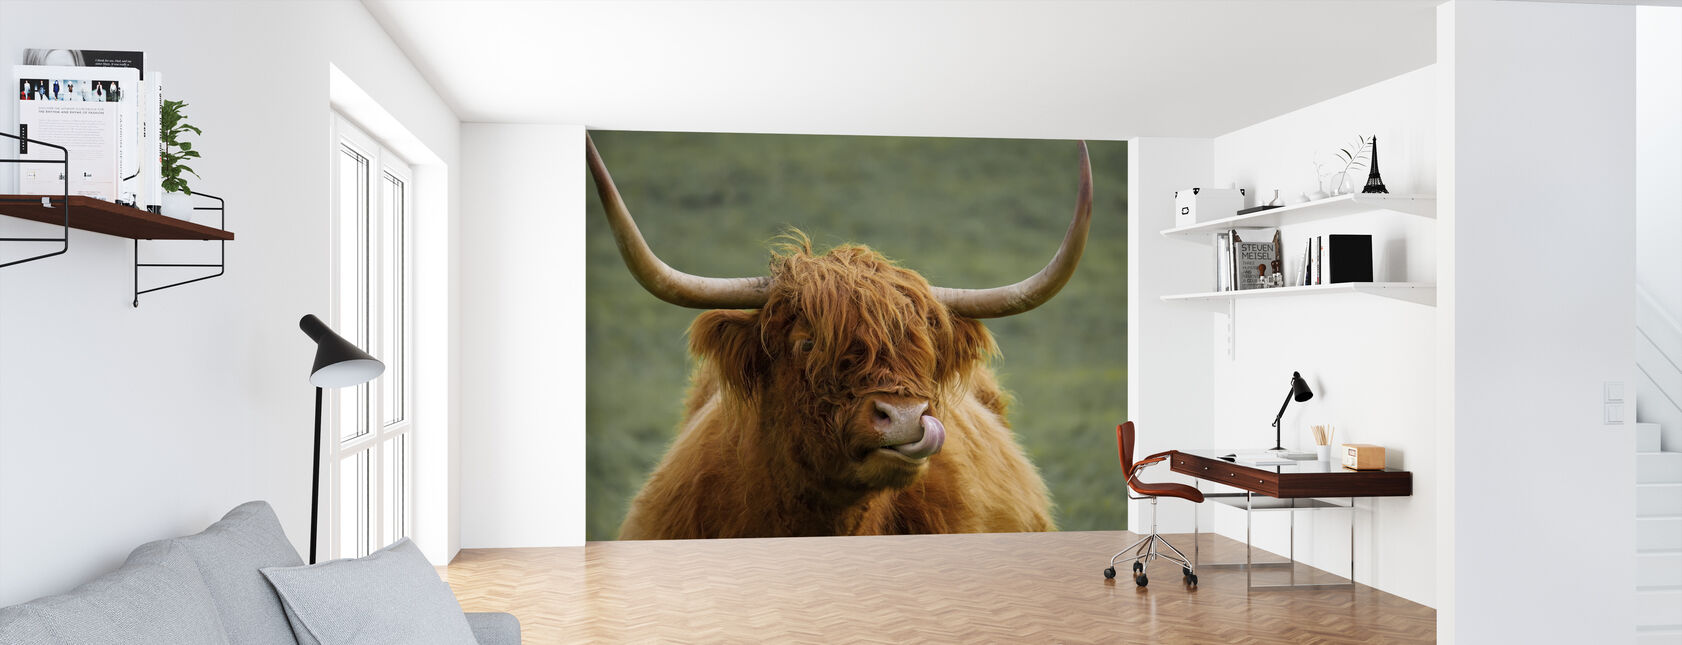 Highland Cattle - Wallpaper - Office